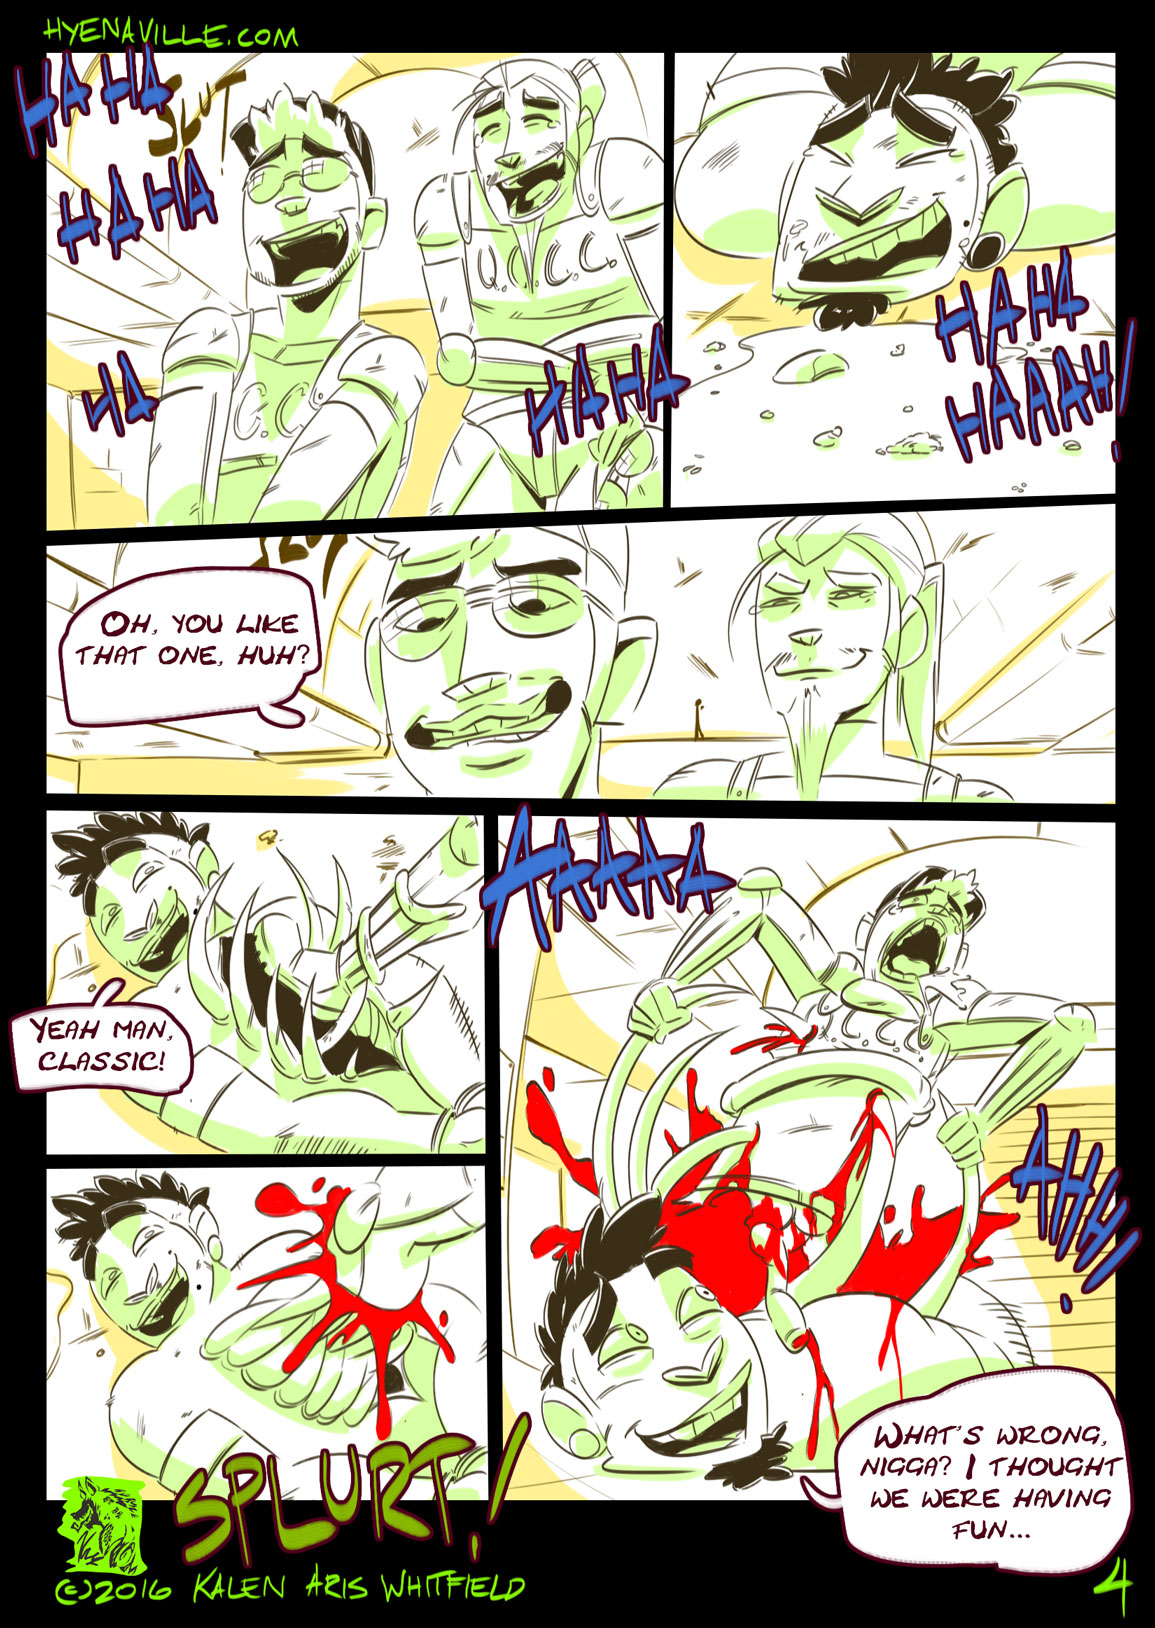 HYENAVILLE page 4